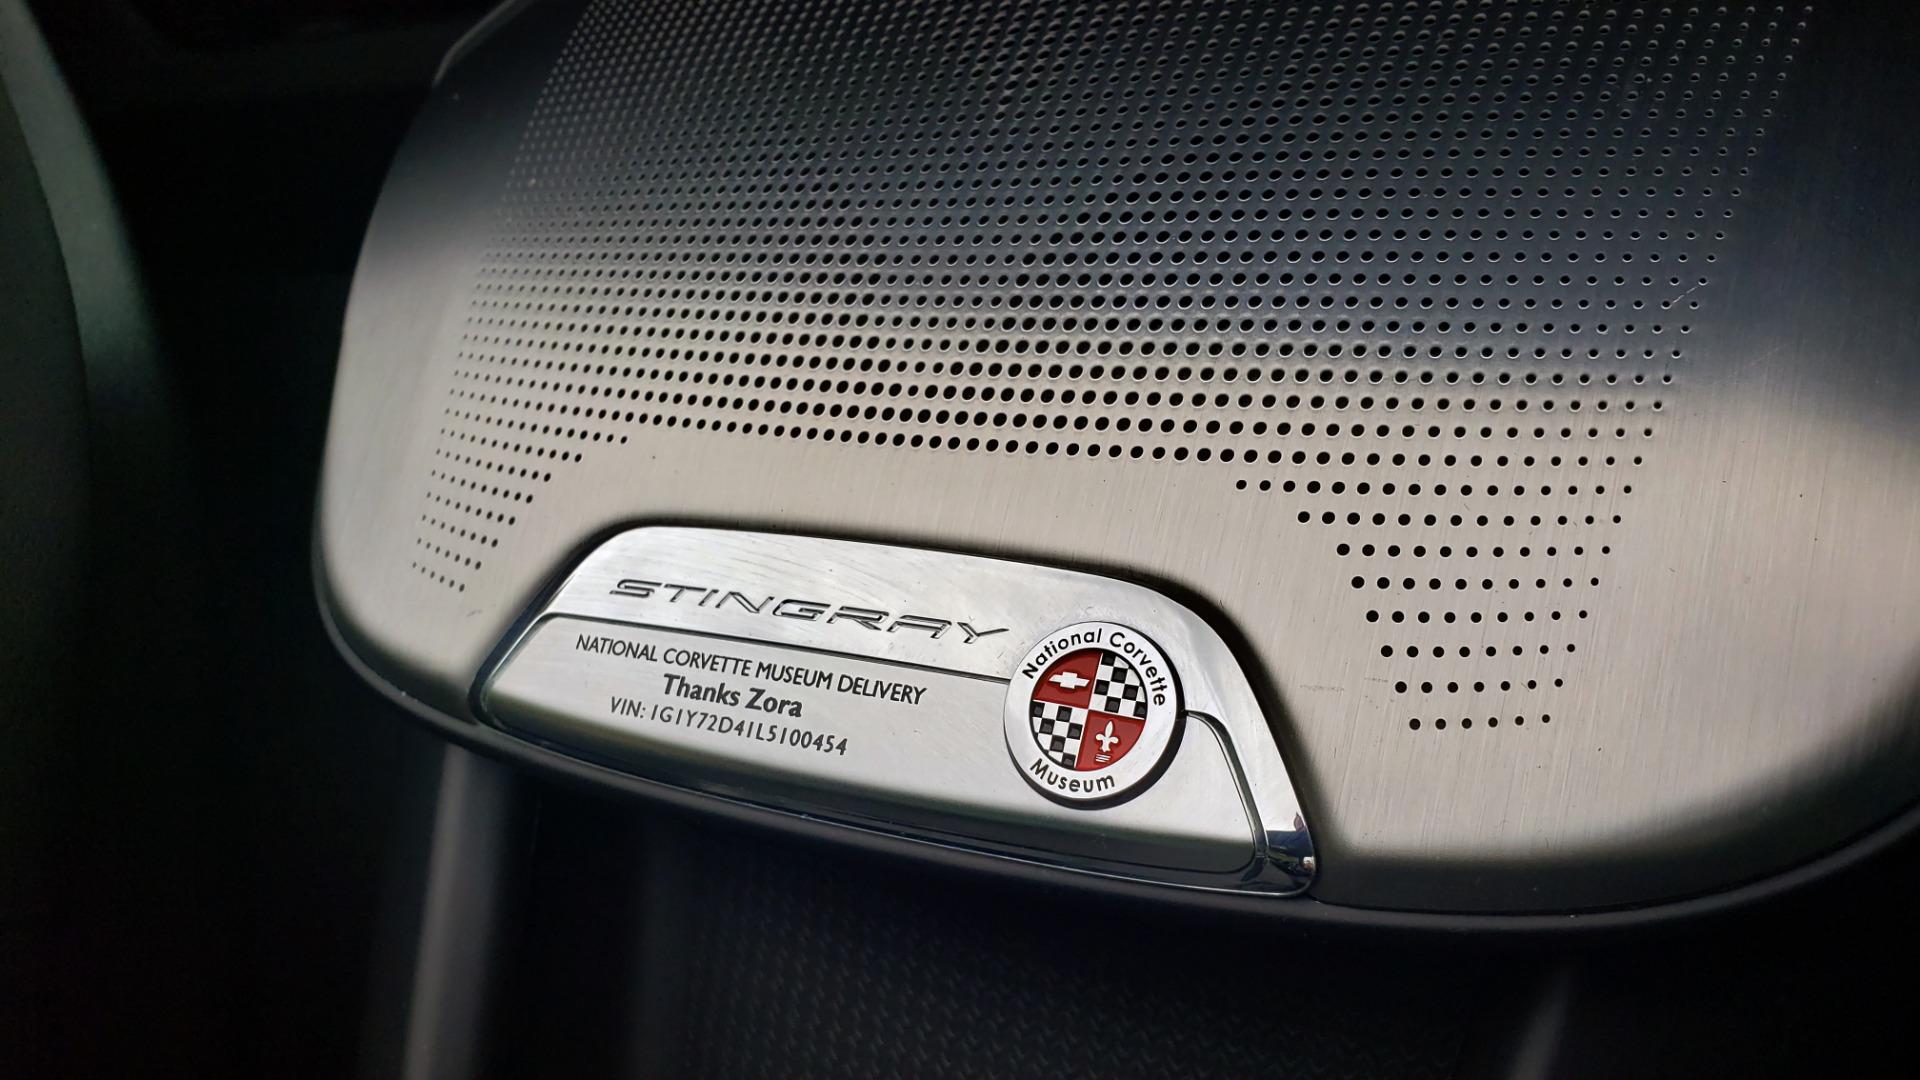 Used 2020 Chevrolet CORVETTE C8 STINGRAY 2LT / 6.2L V8 / 8-SPD AUTO / NAV / BOSE / REARVIEW / DATA RECOR for sale Sold at Formula Imports in Charlotte NC 28227 77